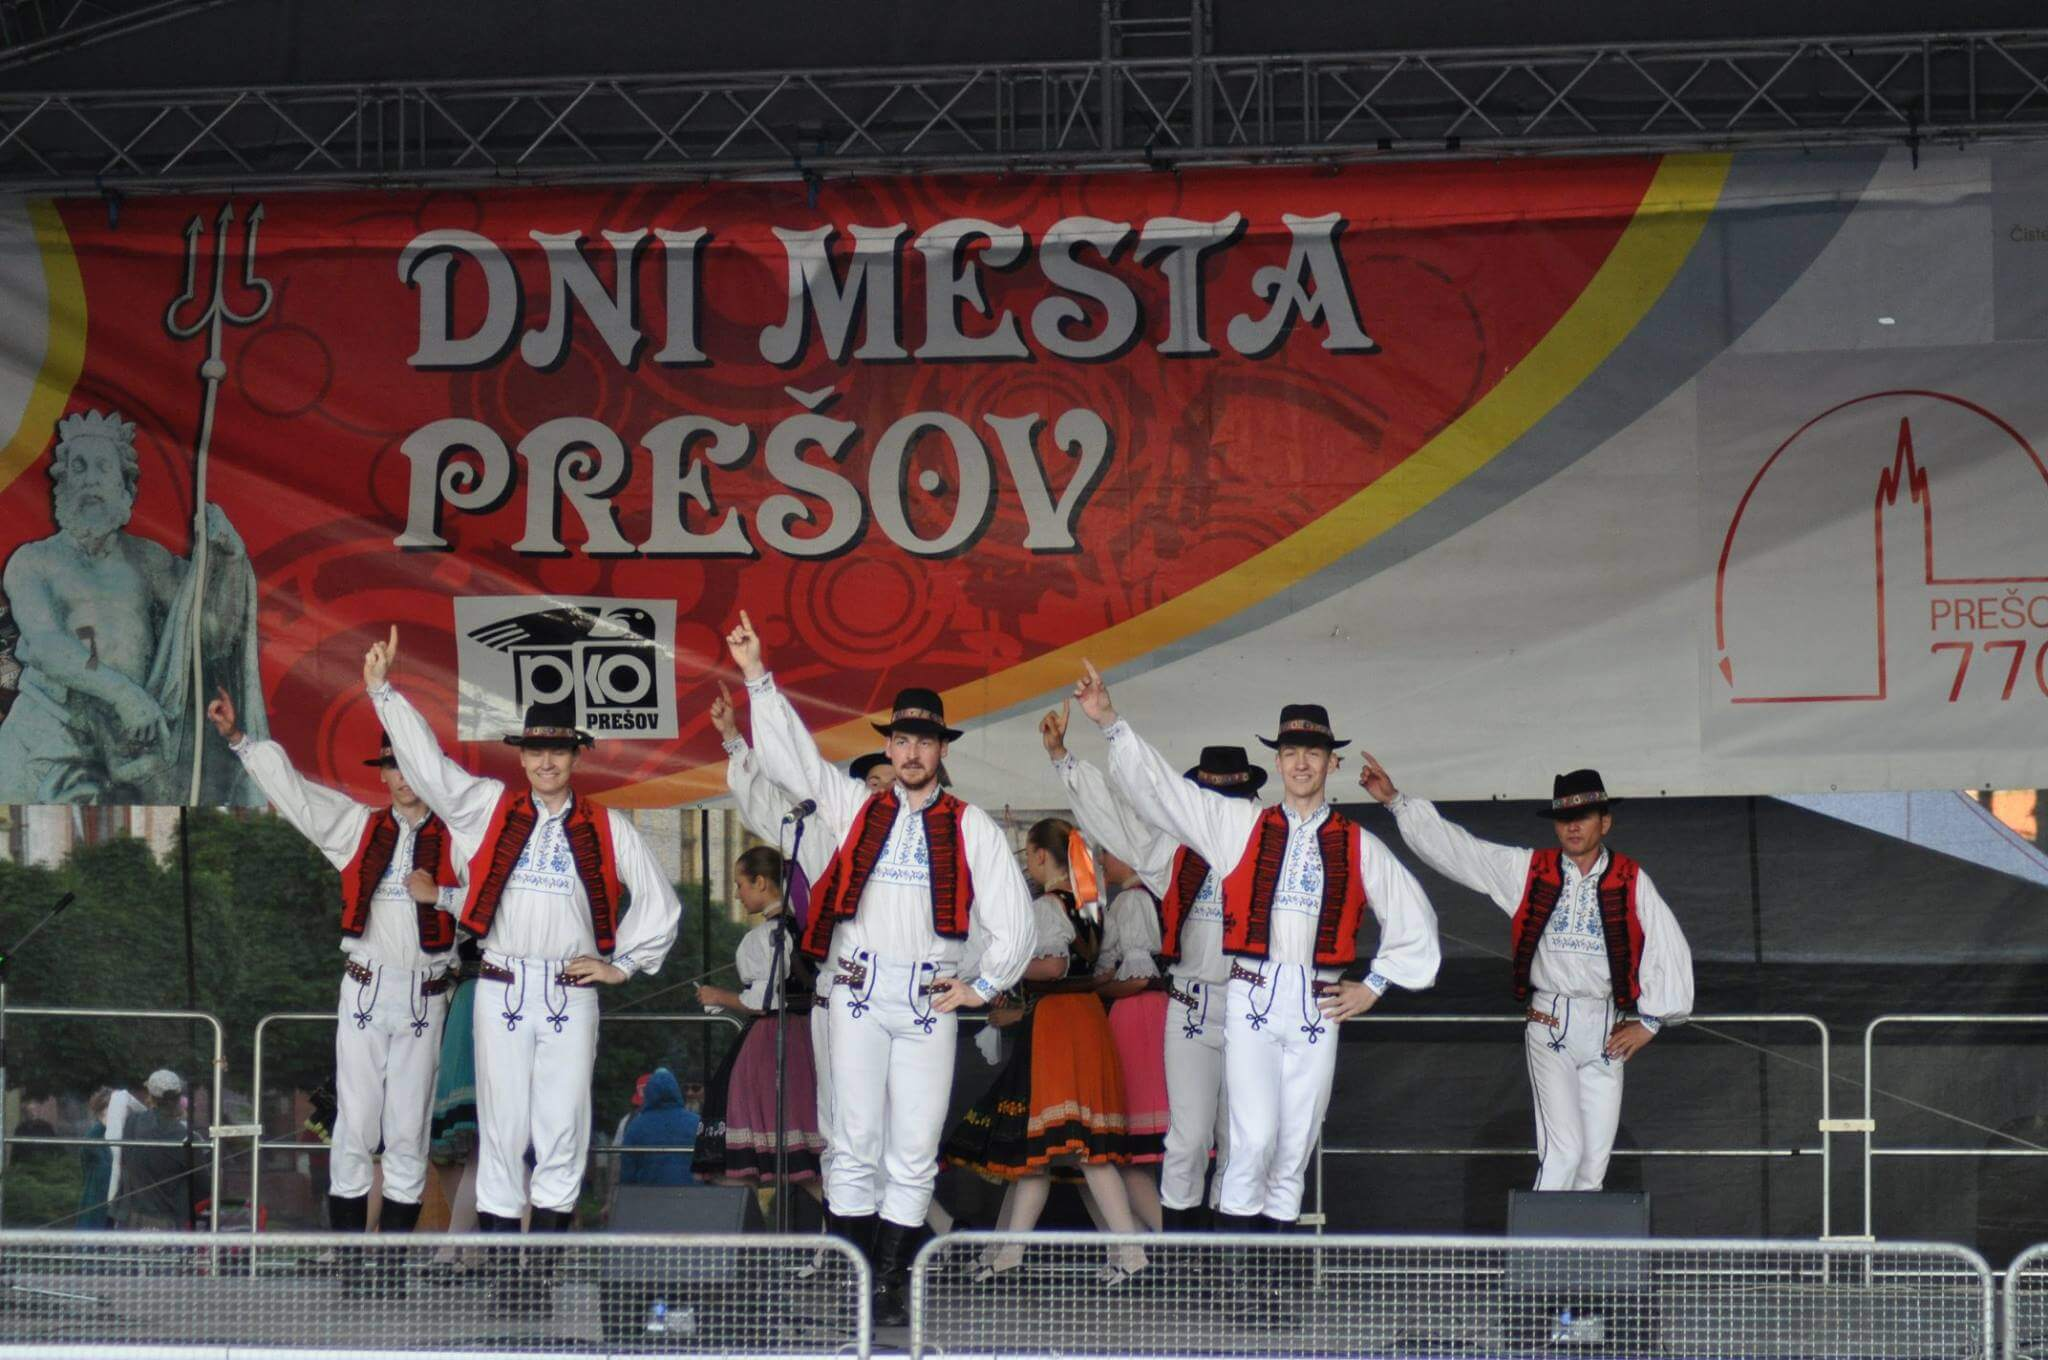 Dni mesta Prešov 2017